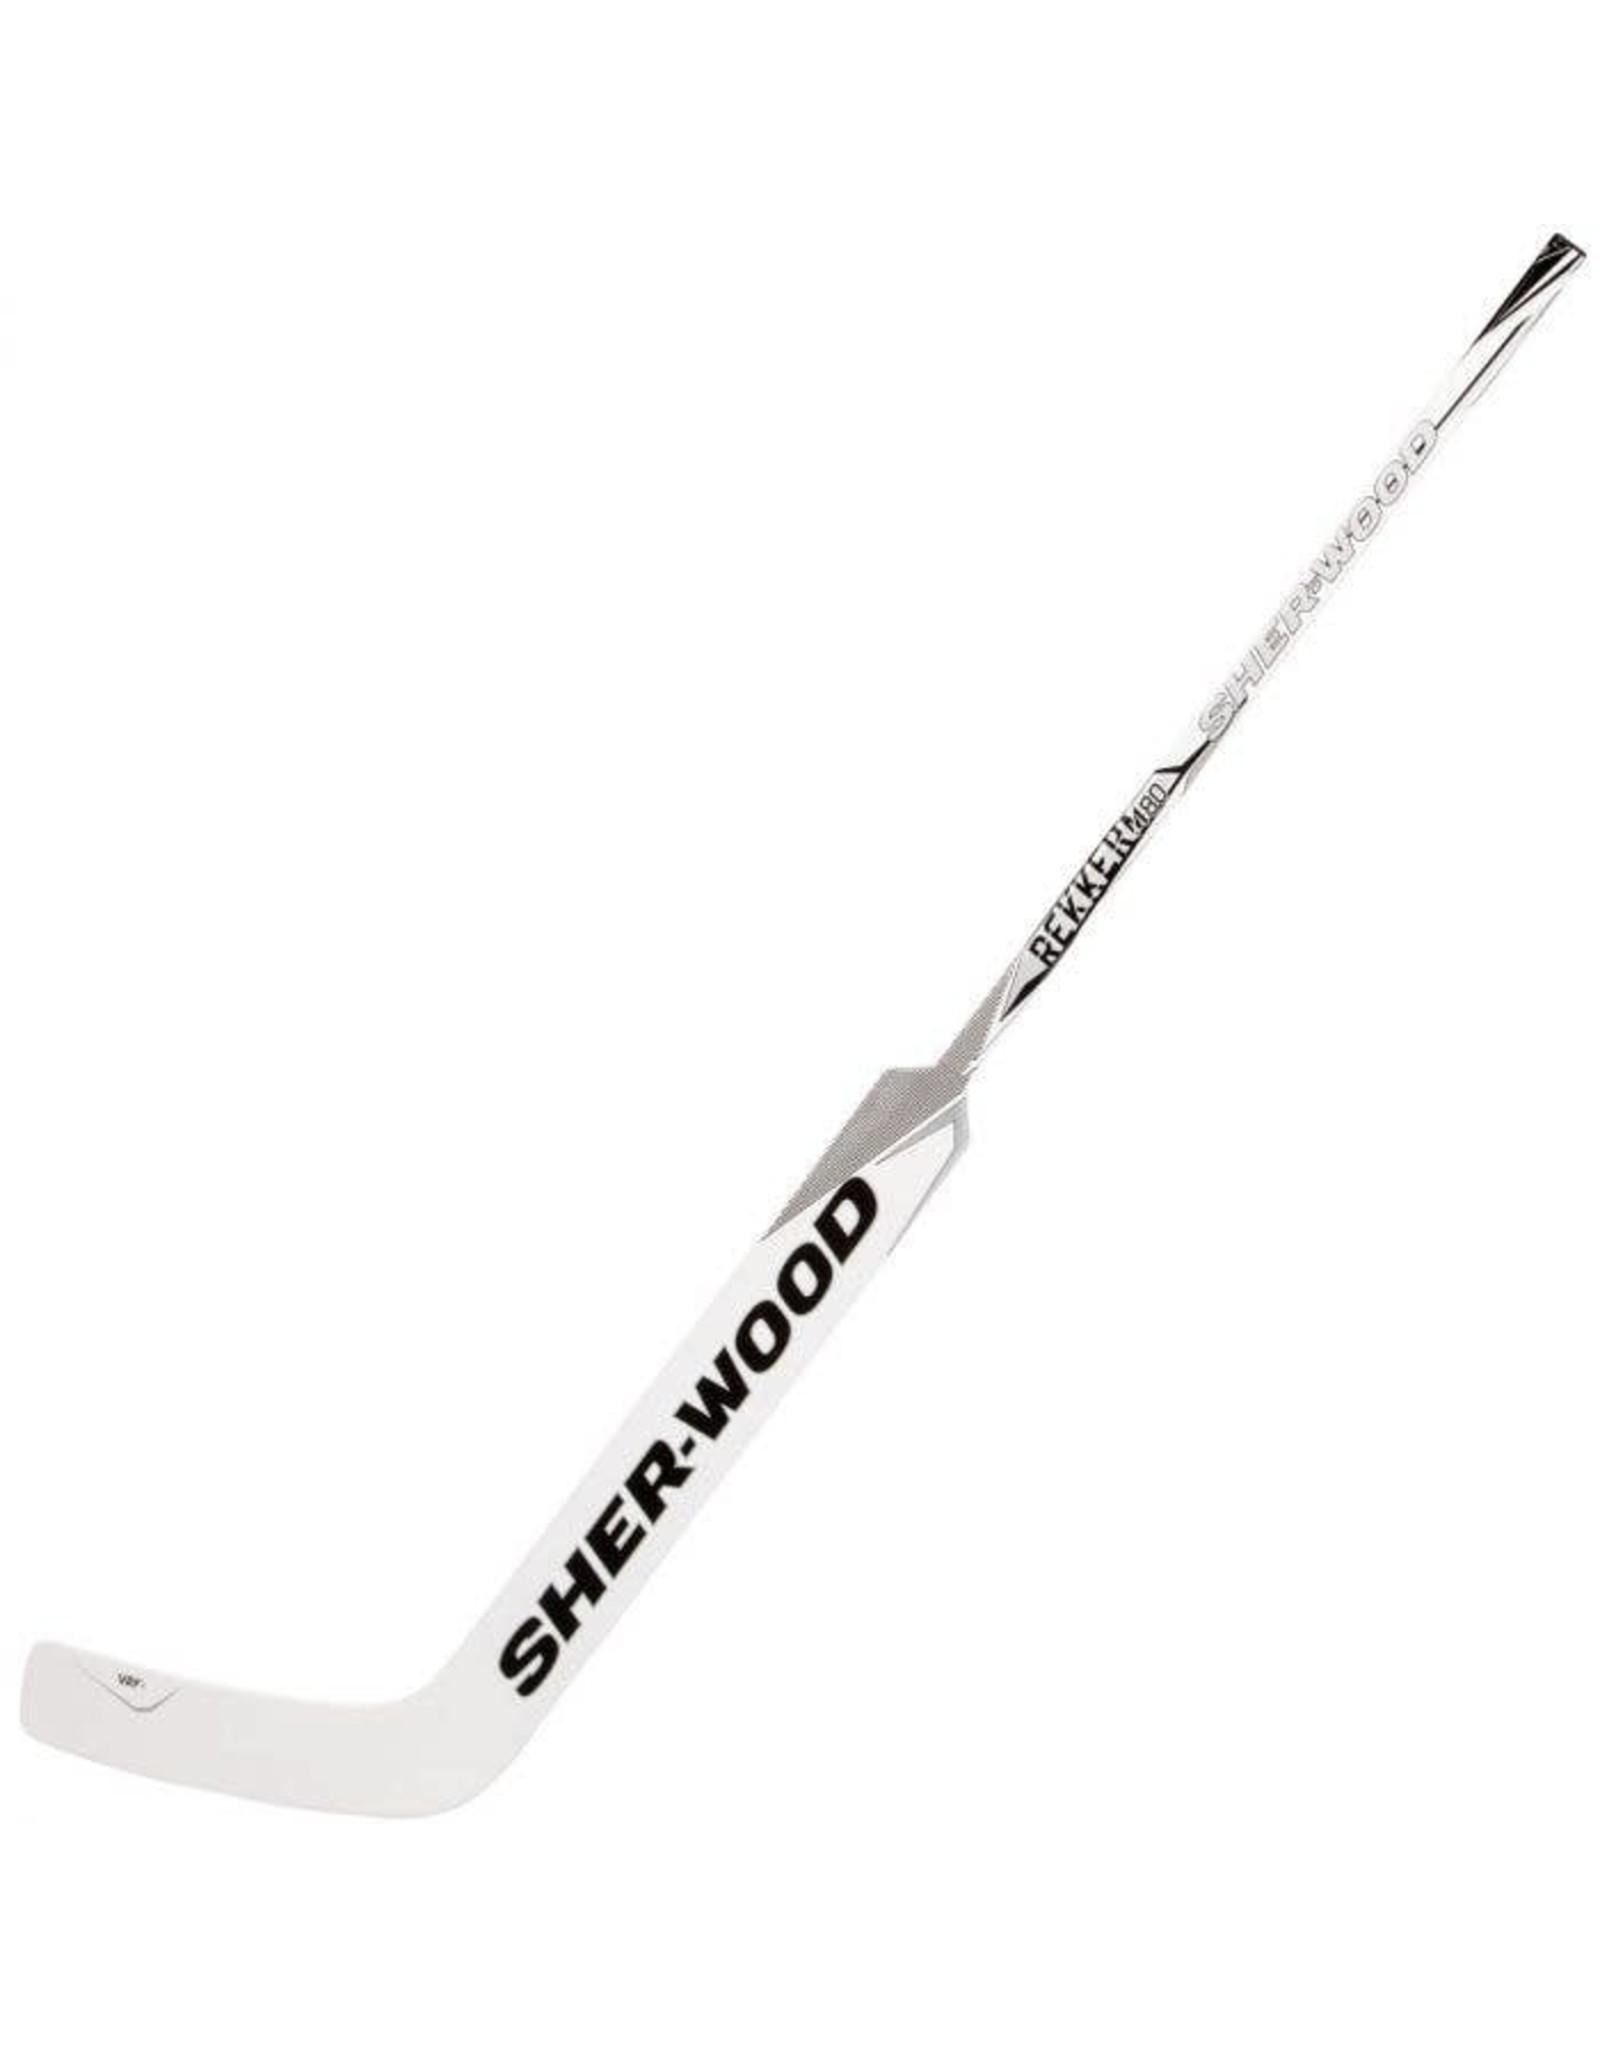 SHER-WOOD Rekker M80, Intermediate, Goalie Stick